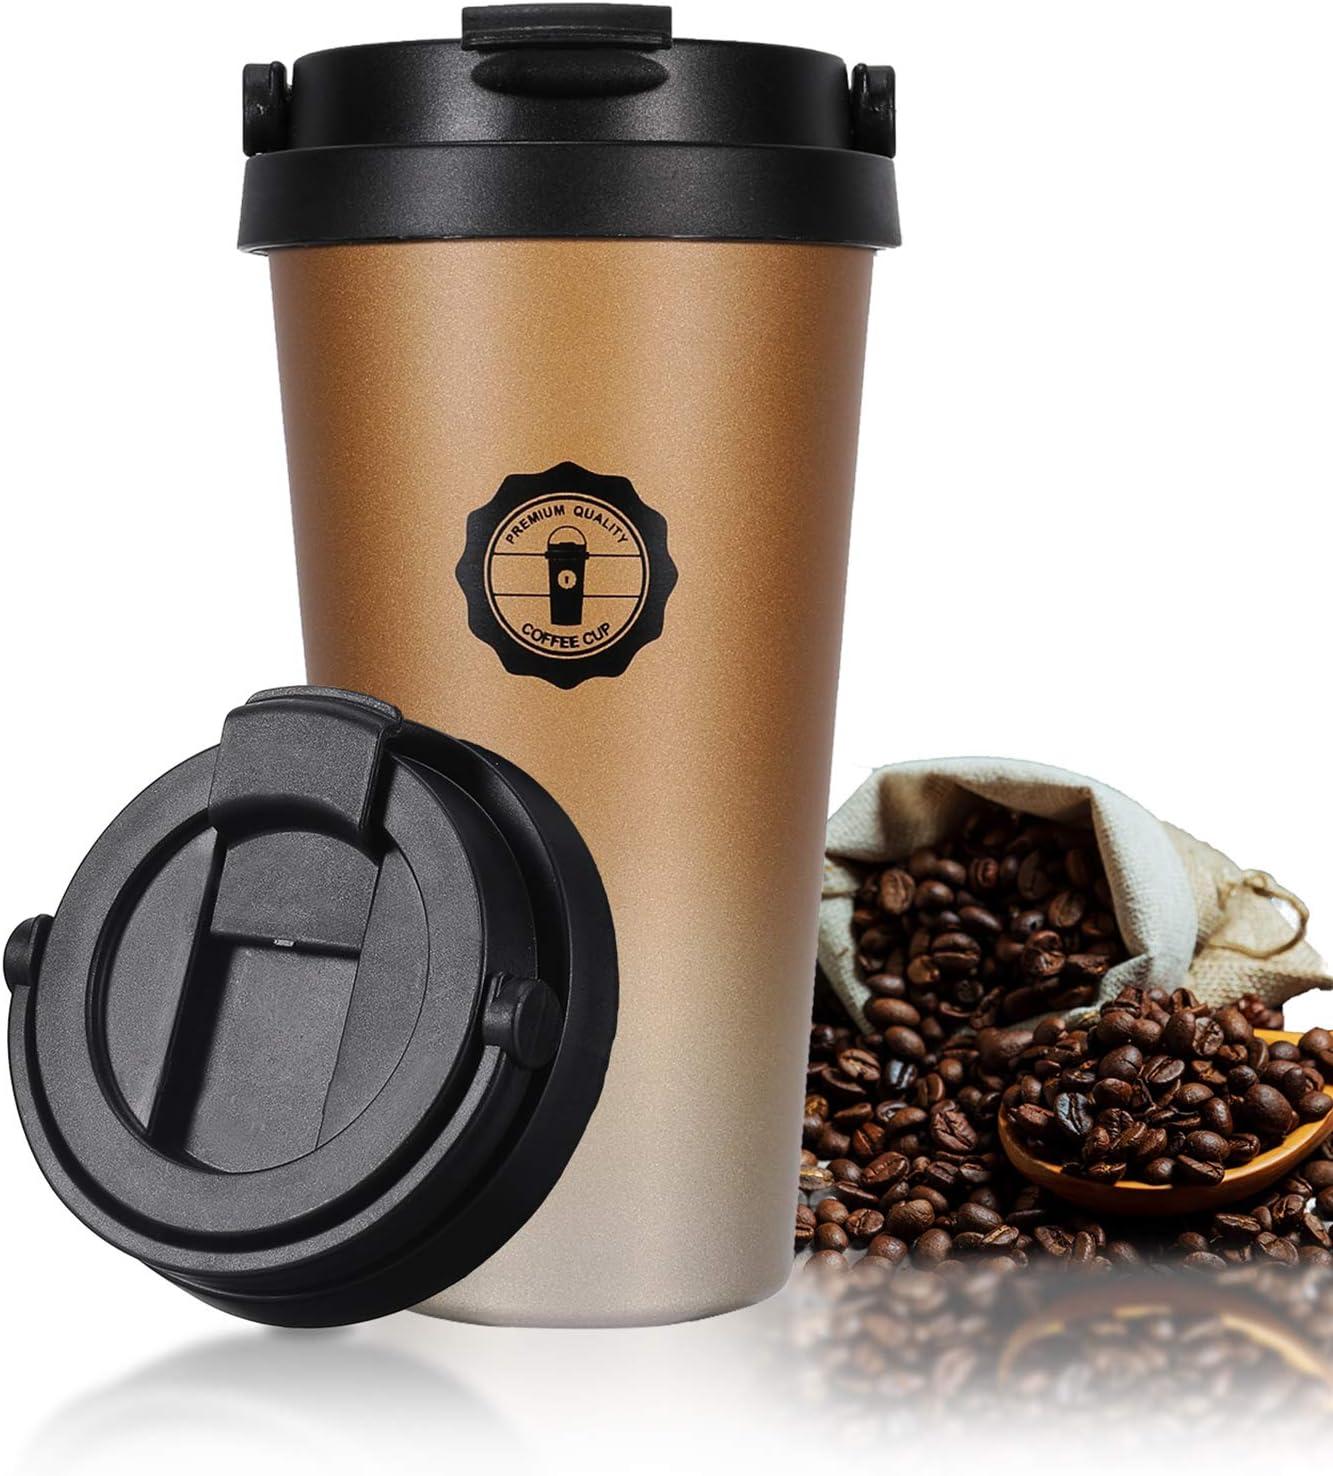 Jovego Termo Taza de Café, 500ml Vaso Termico de Viaje 100% a Prueba de Fugas, Taza de Acero Inoxidable para Beber con Aislamiento de Doble Pared, Tazas Cafe Reutilizable para Niños & Adultos(Oro)